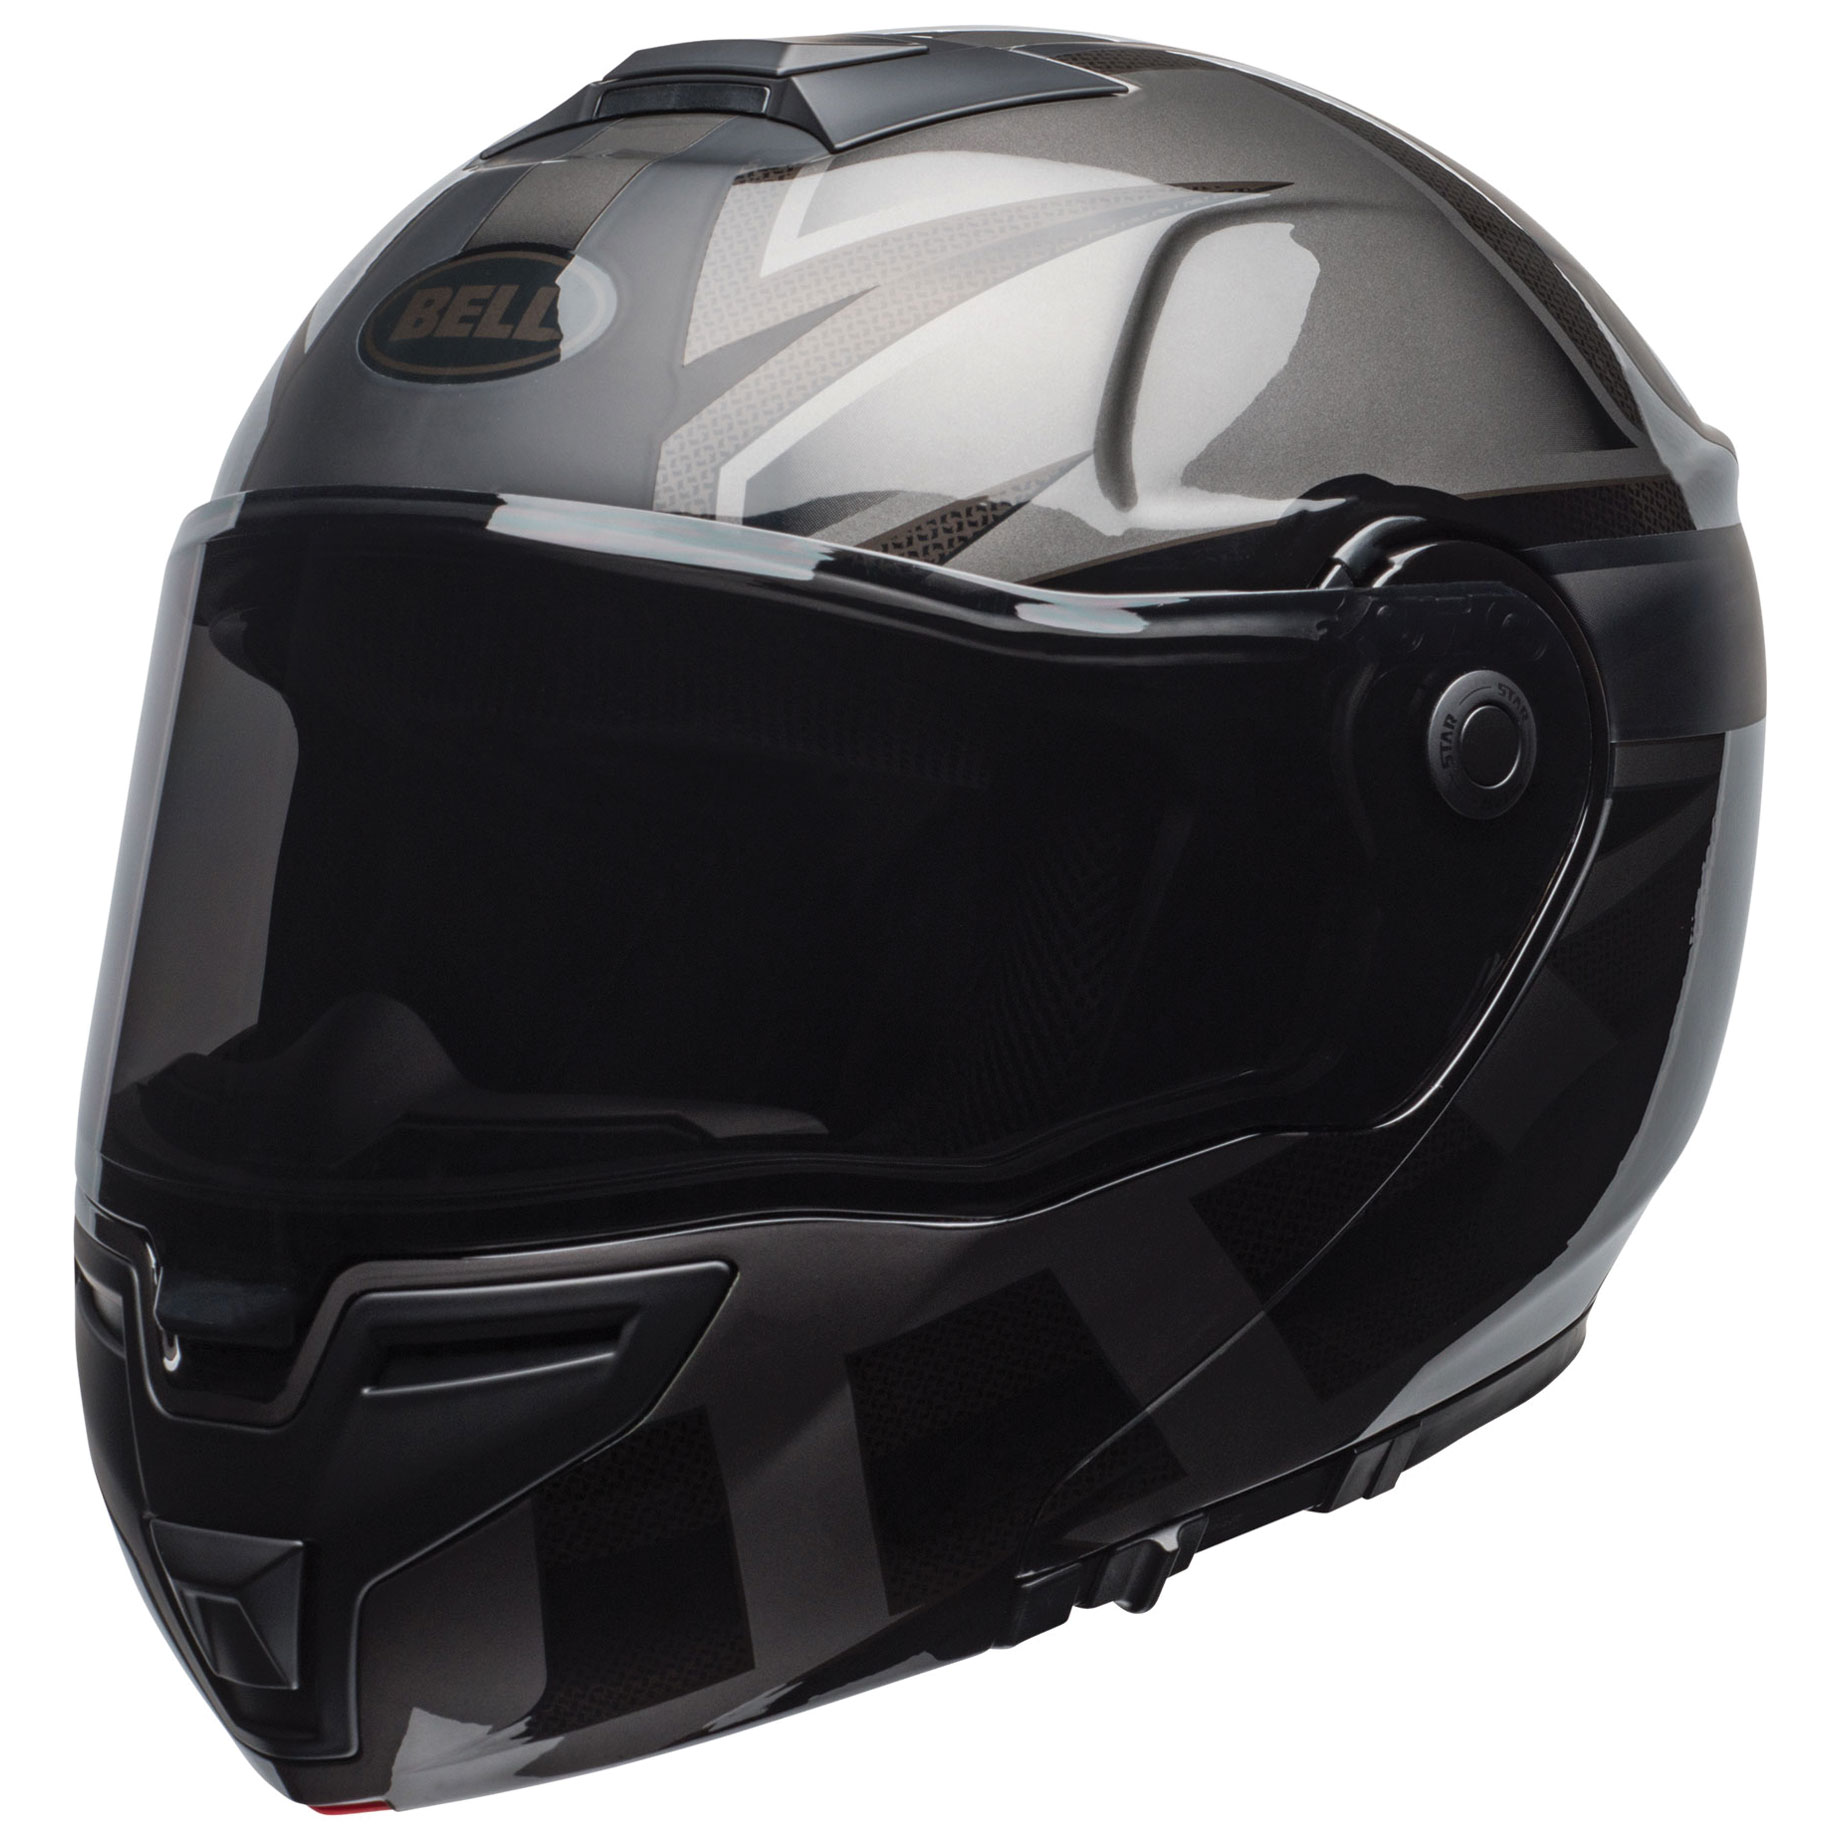 Bell SRT Blackout Predator Modular Helmet